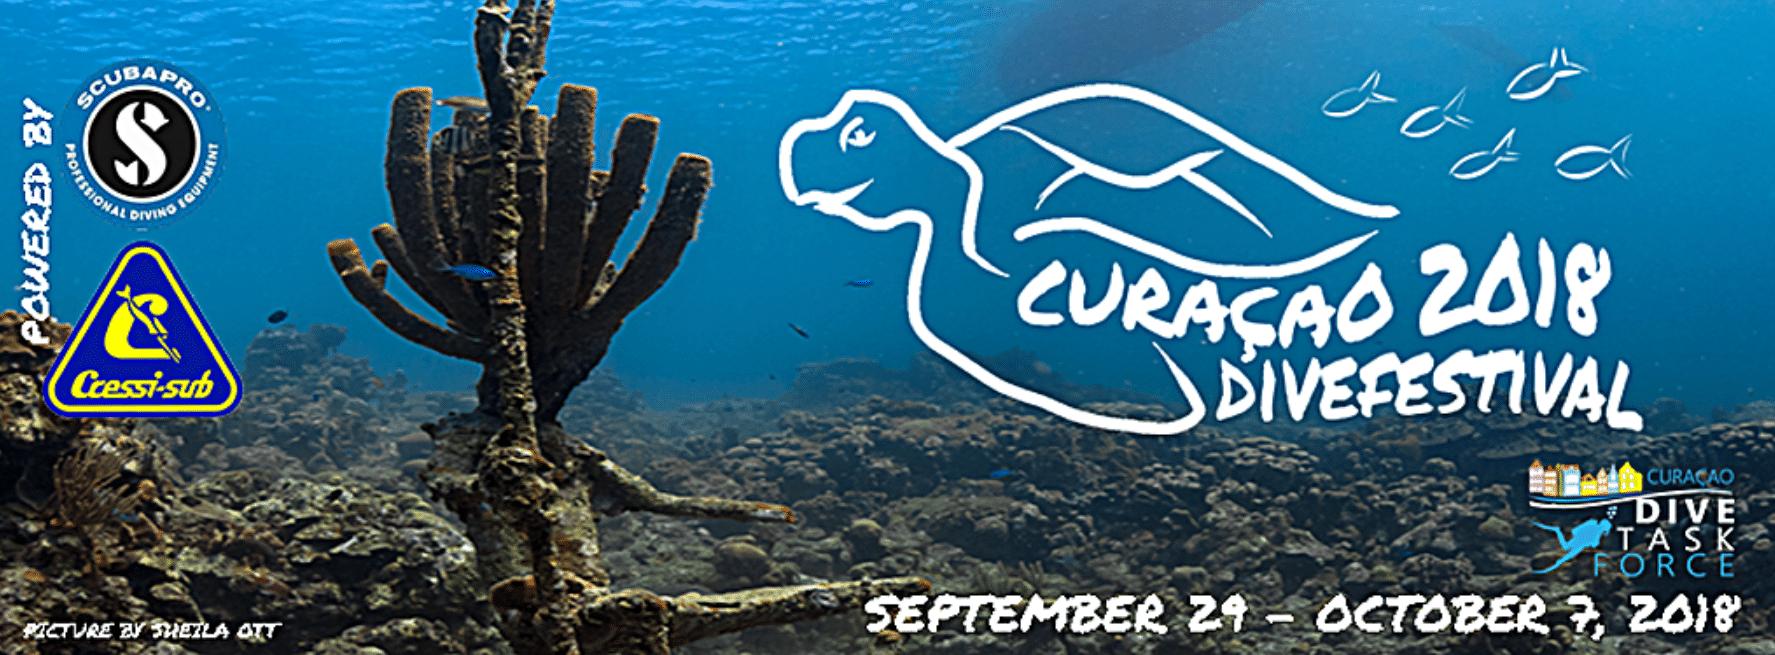 Curacao 2018 Dive Festival